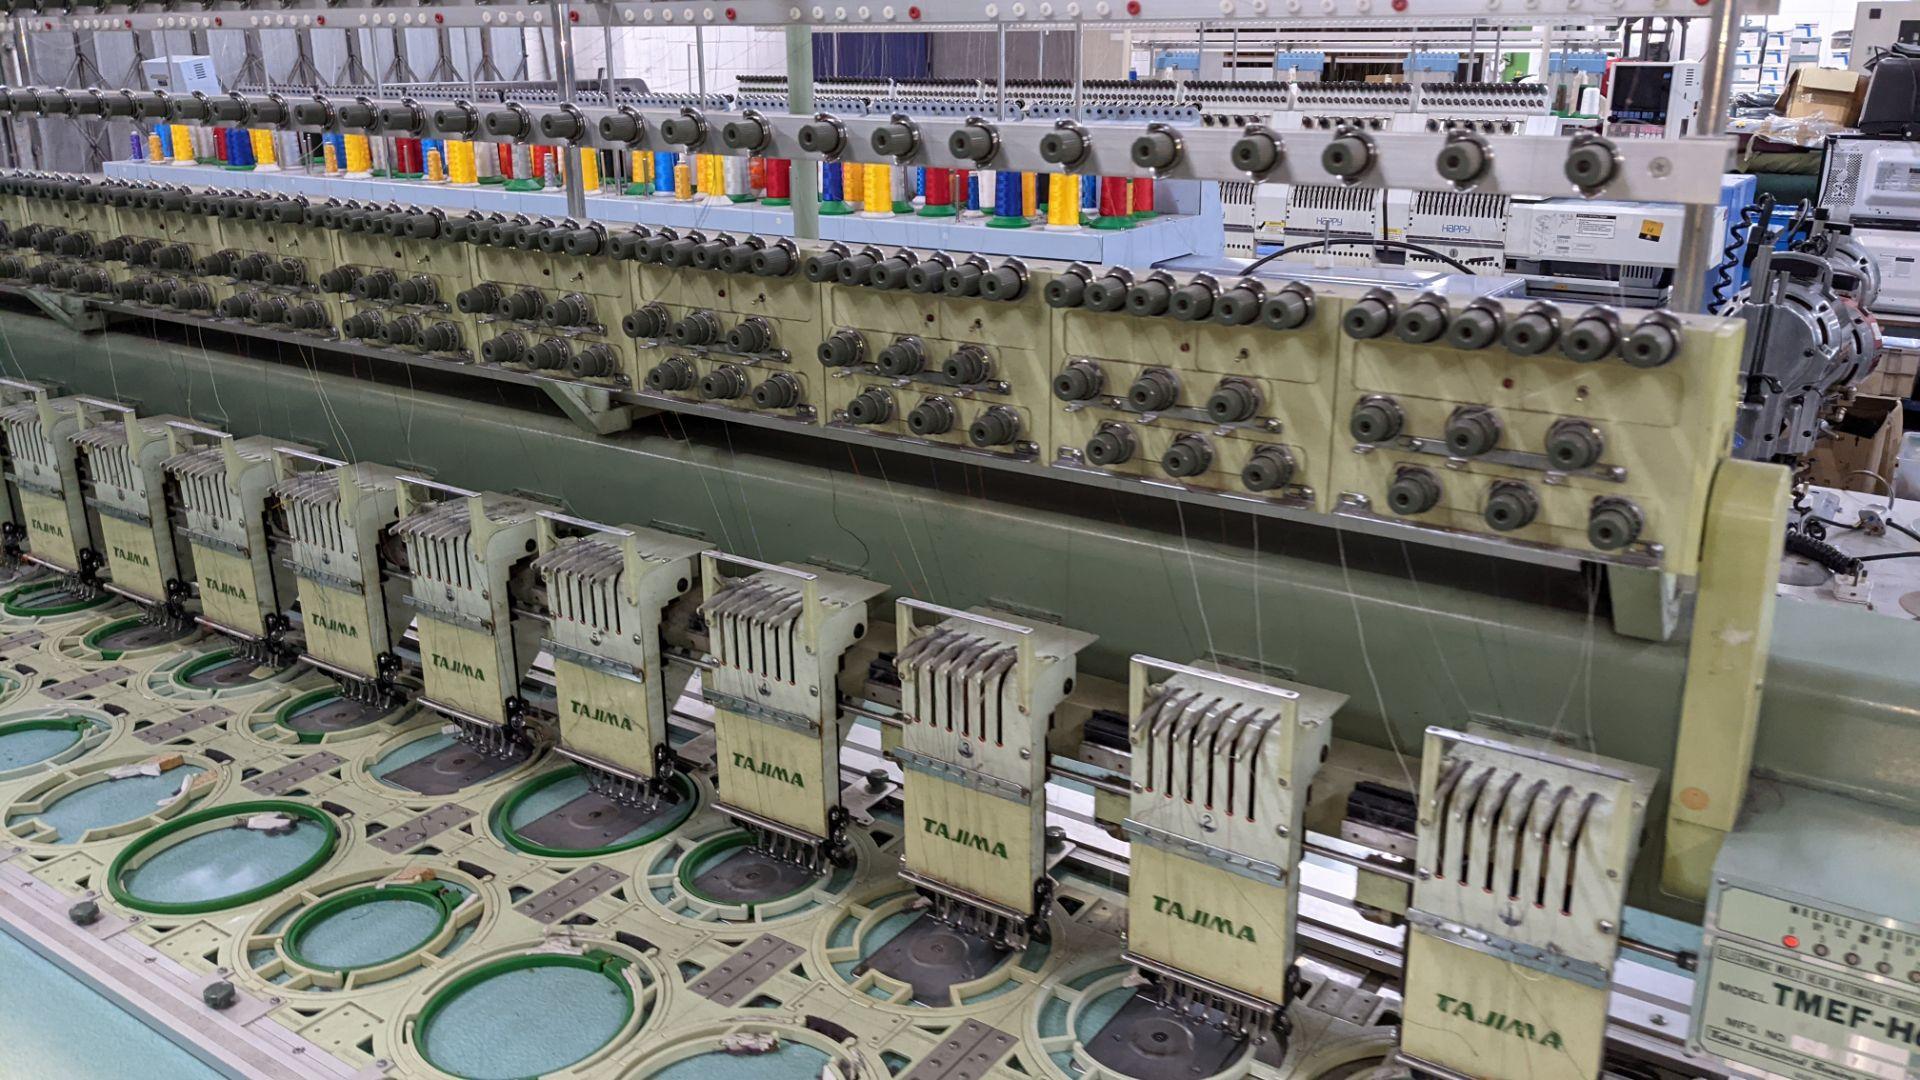 Tokai Tajima electronic 20 head automatic embroidery machine model TMEF-H620 - Image 6 of 25